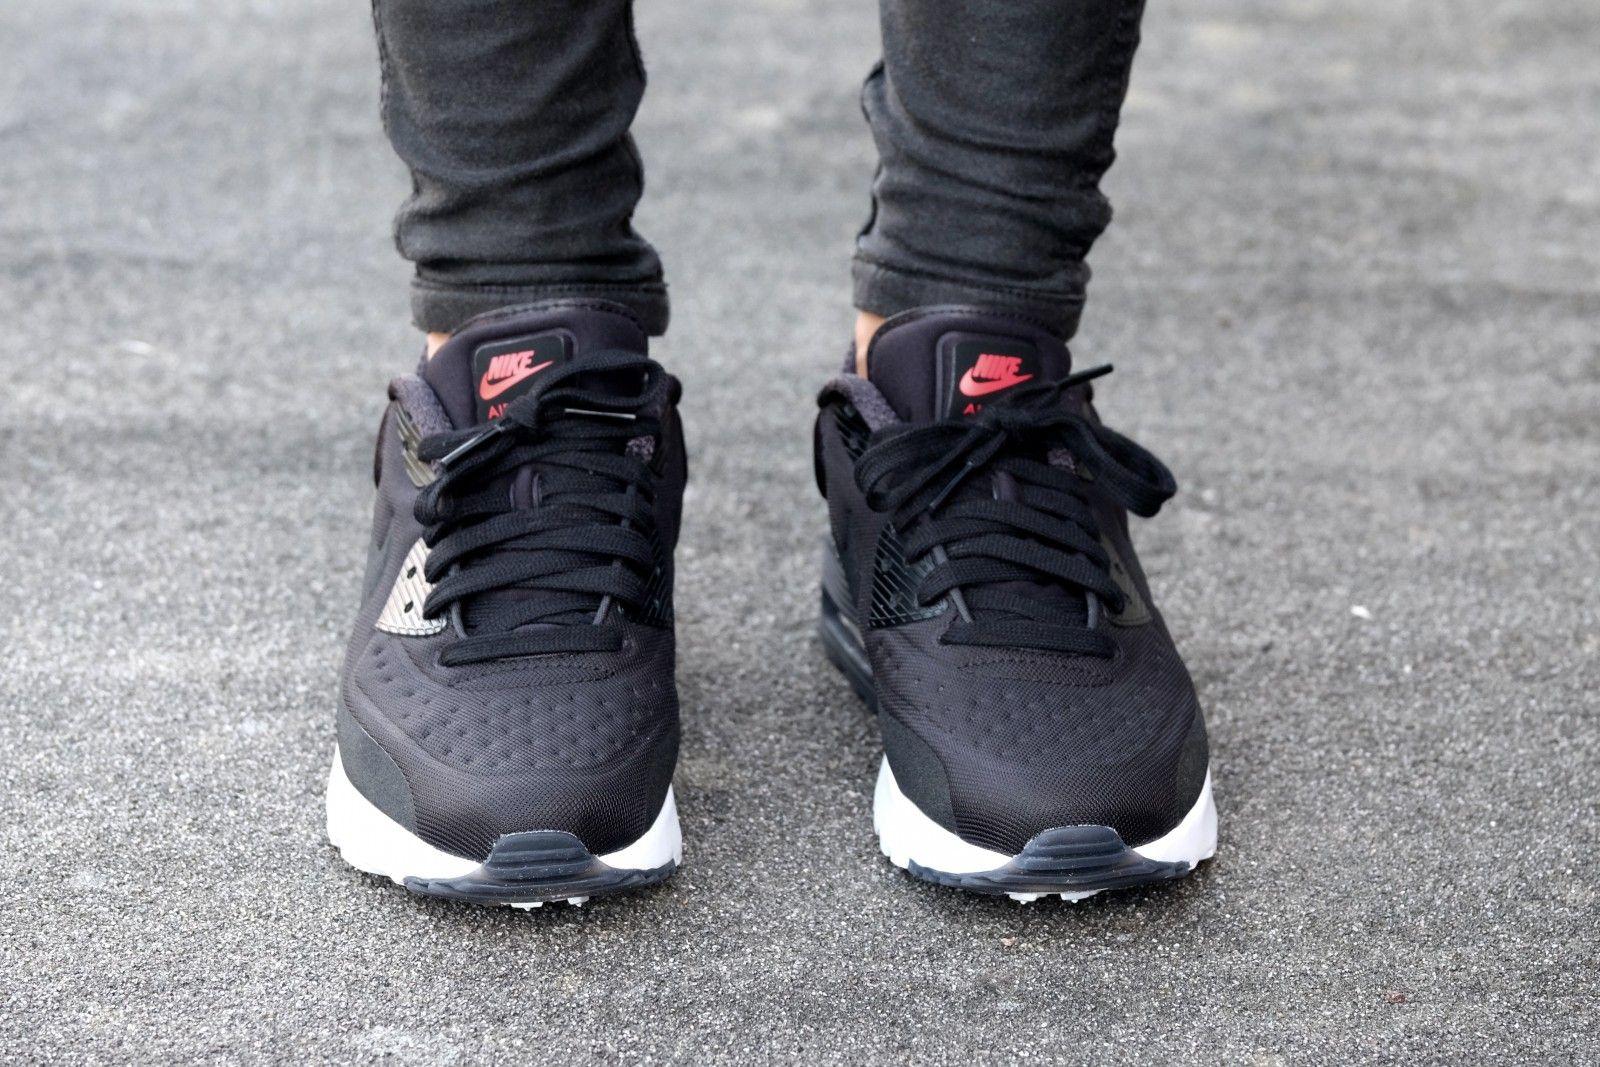 Nike Air Max 90 Ultra Special Edition Premium GS Black